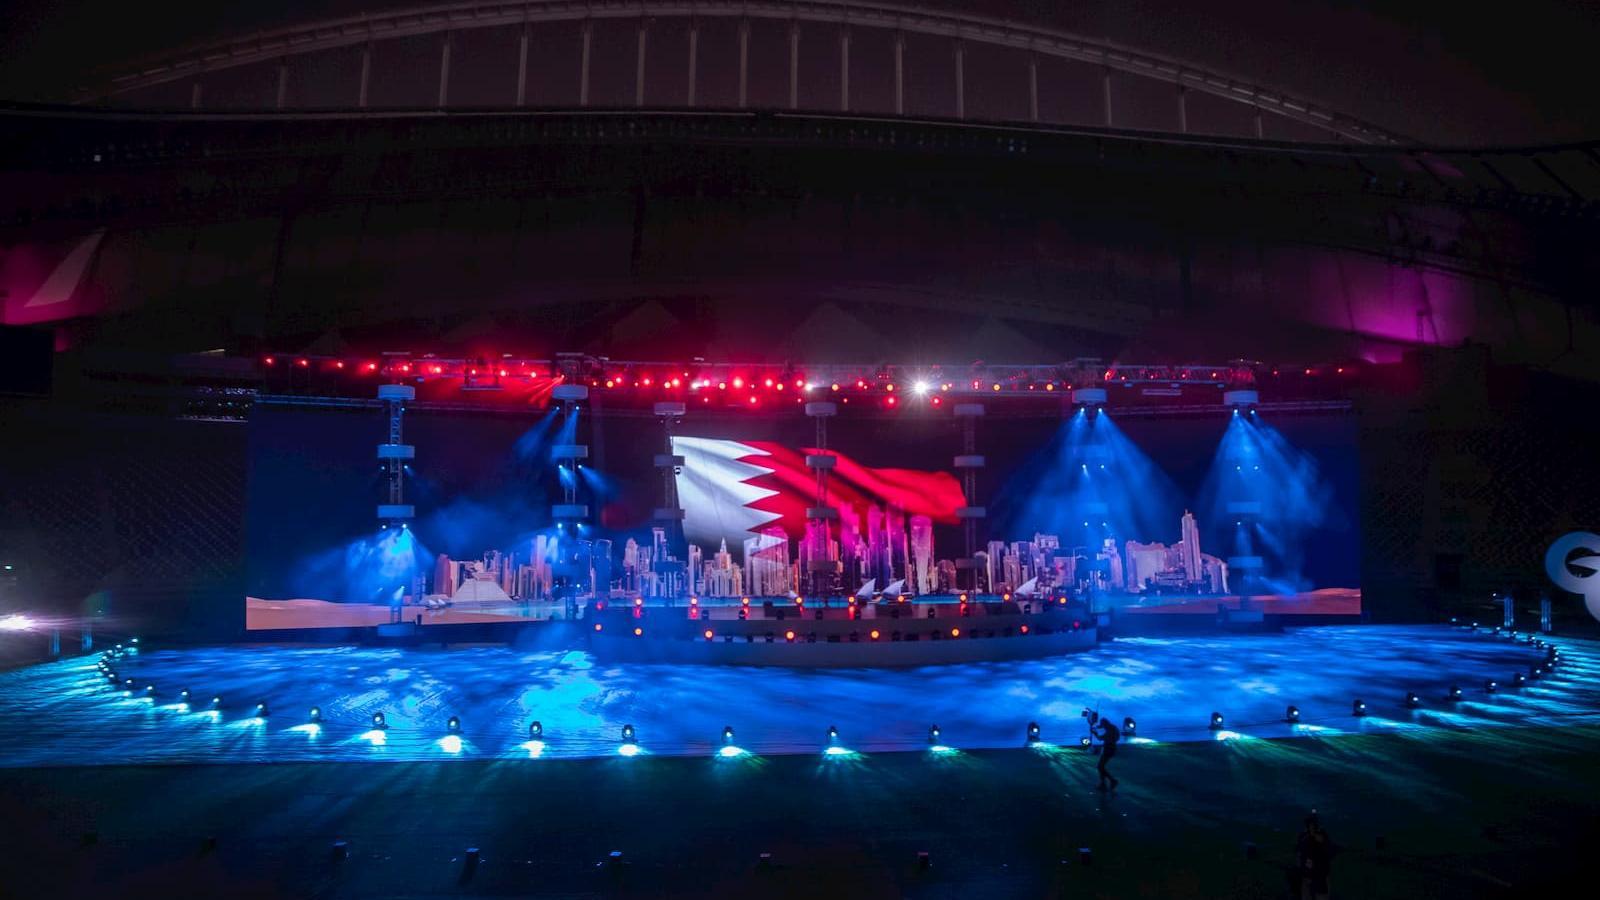 WATCH: Qatar Esports WEGA Global Games launched in style